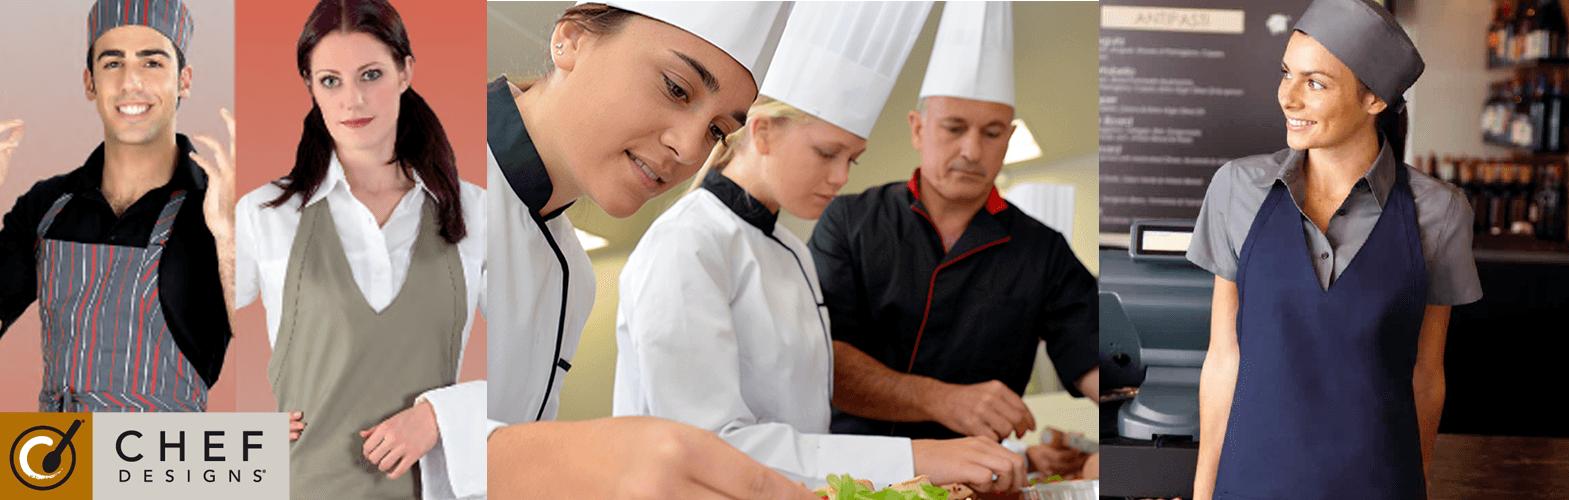 Chef Designs Apparel